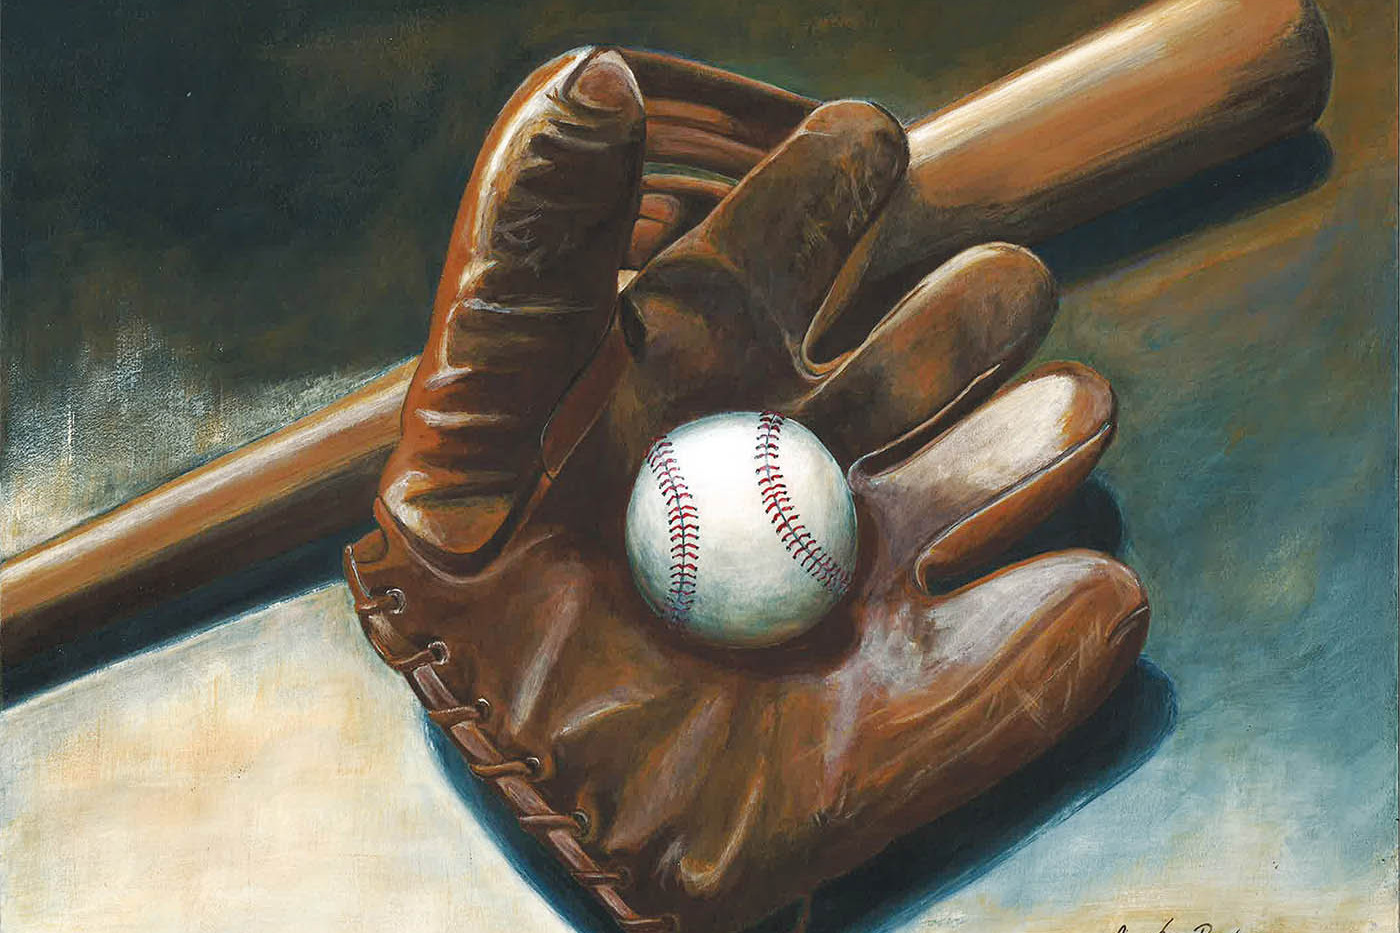 Vintage-Baseball-Glove-Web.jpg